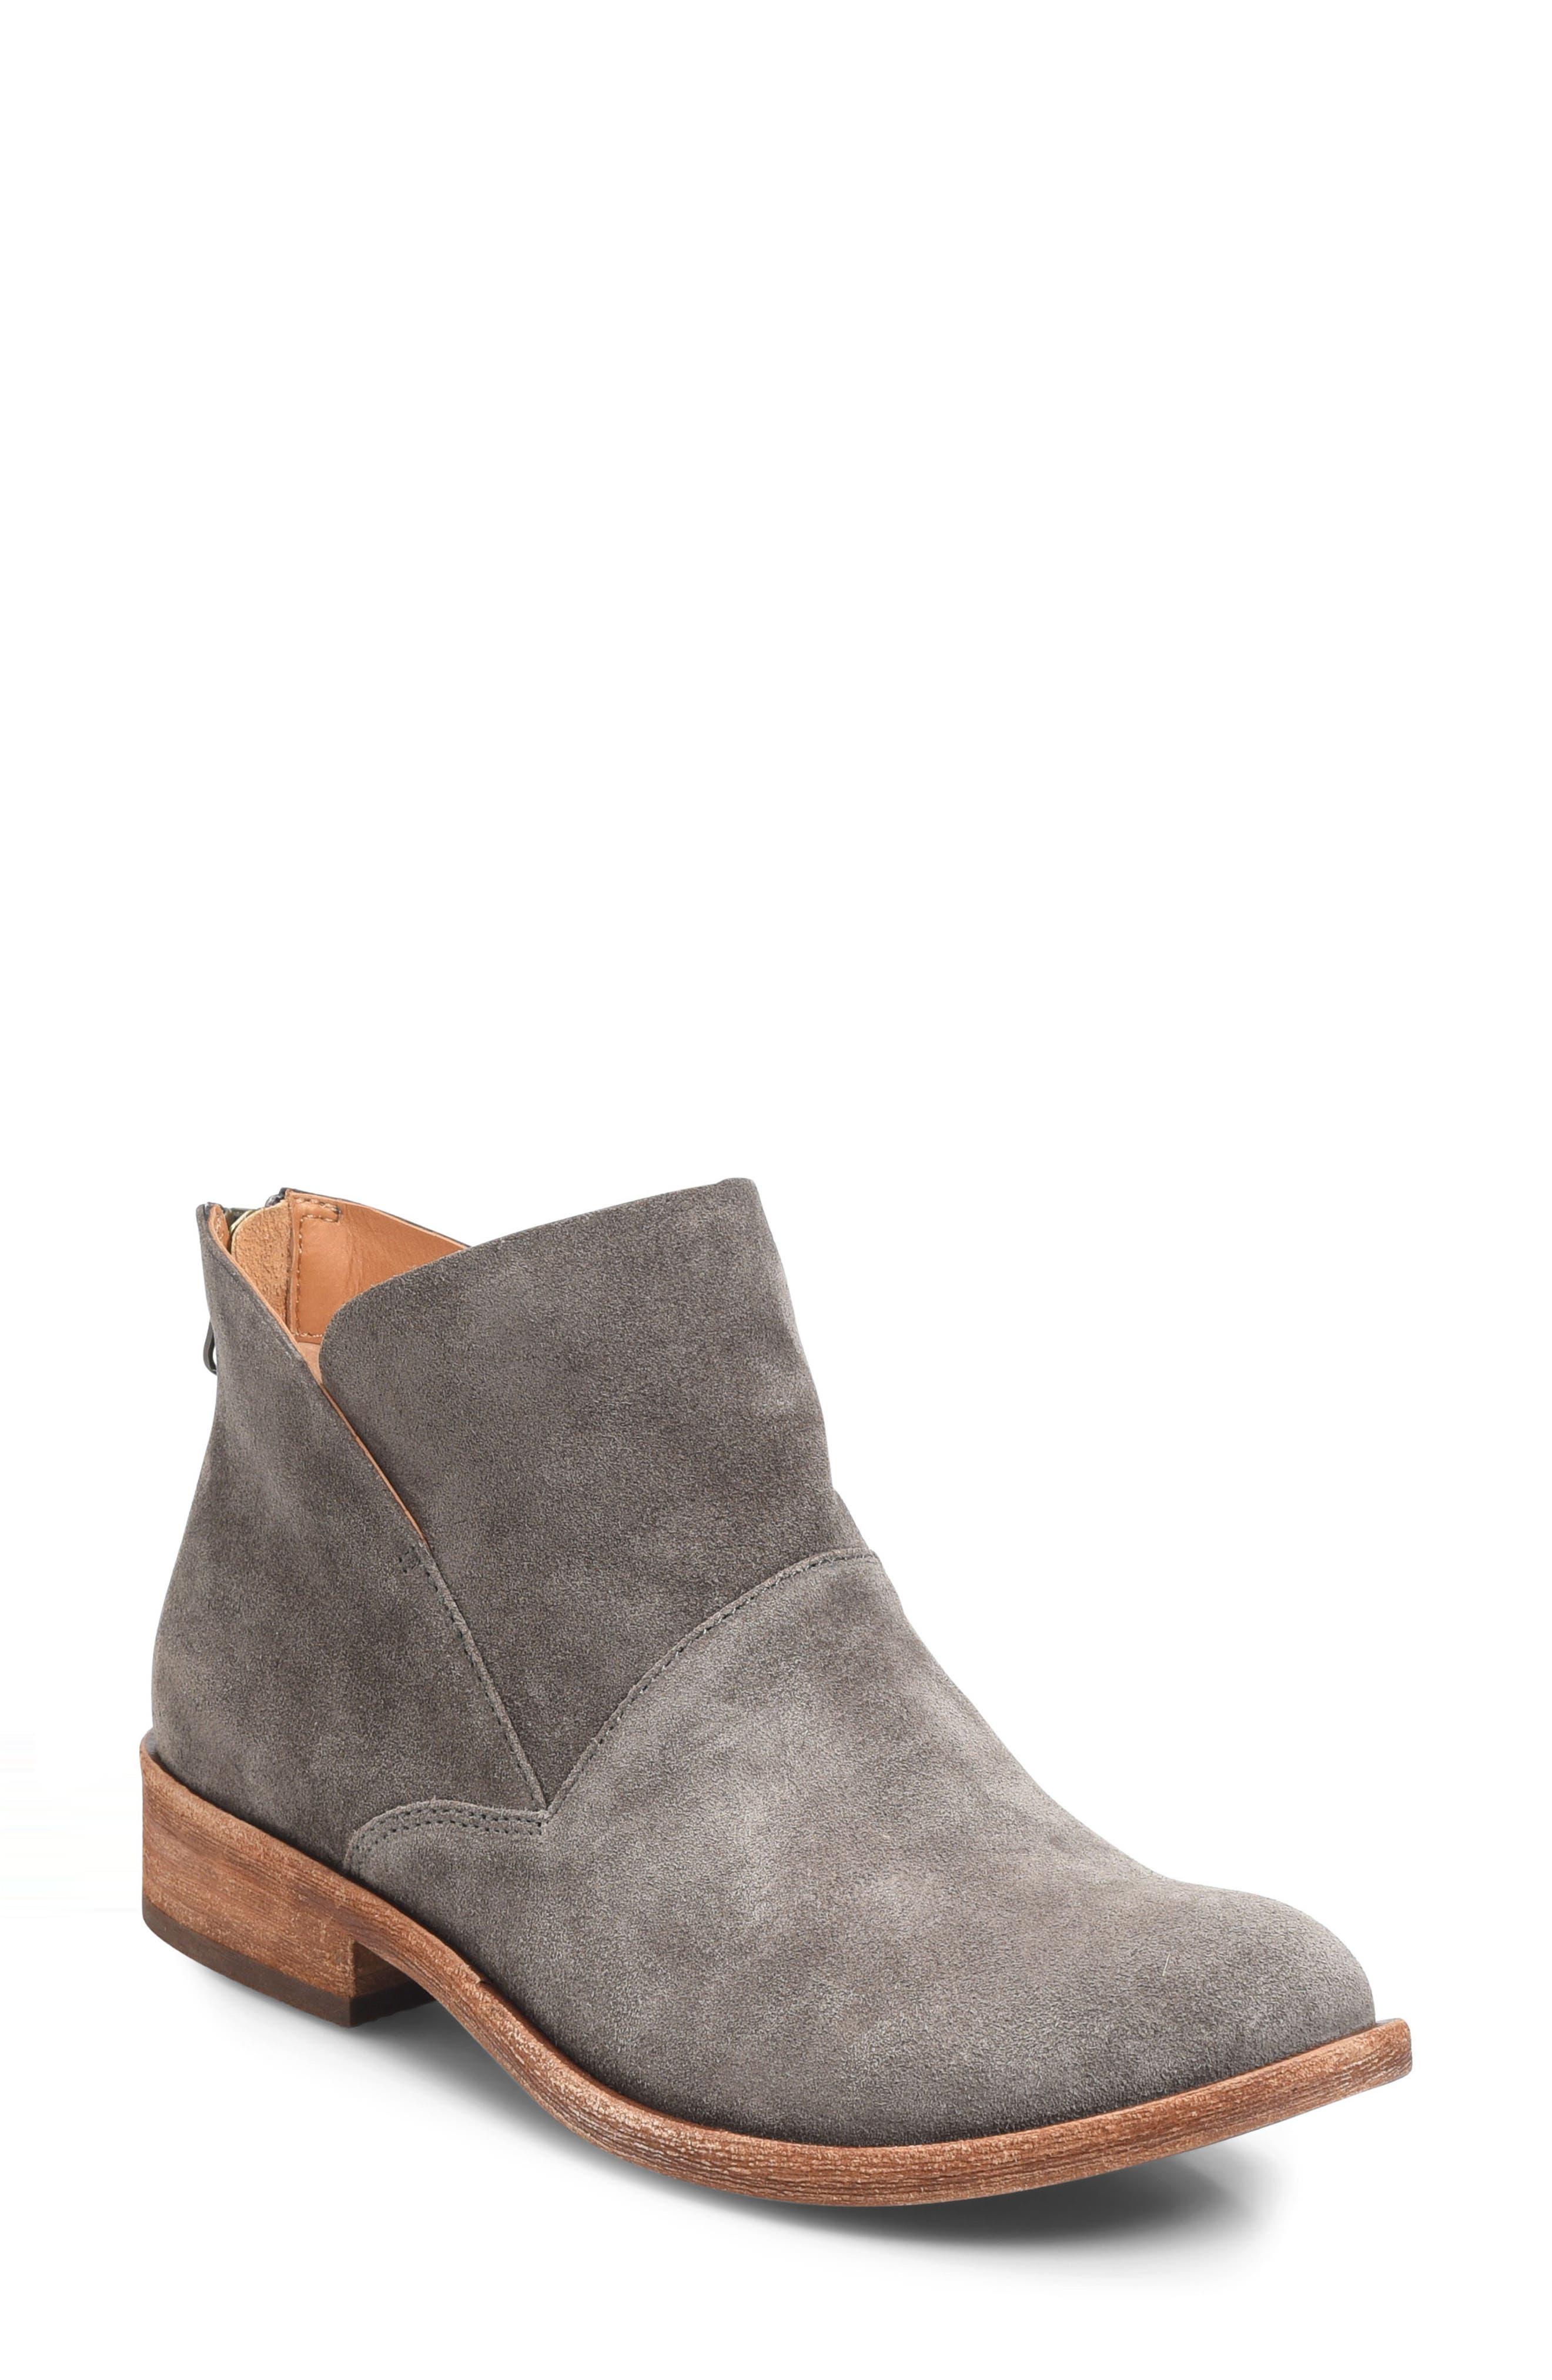 Main Image - Kork-Ease® Ryder Ankle Boot (Women)